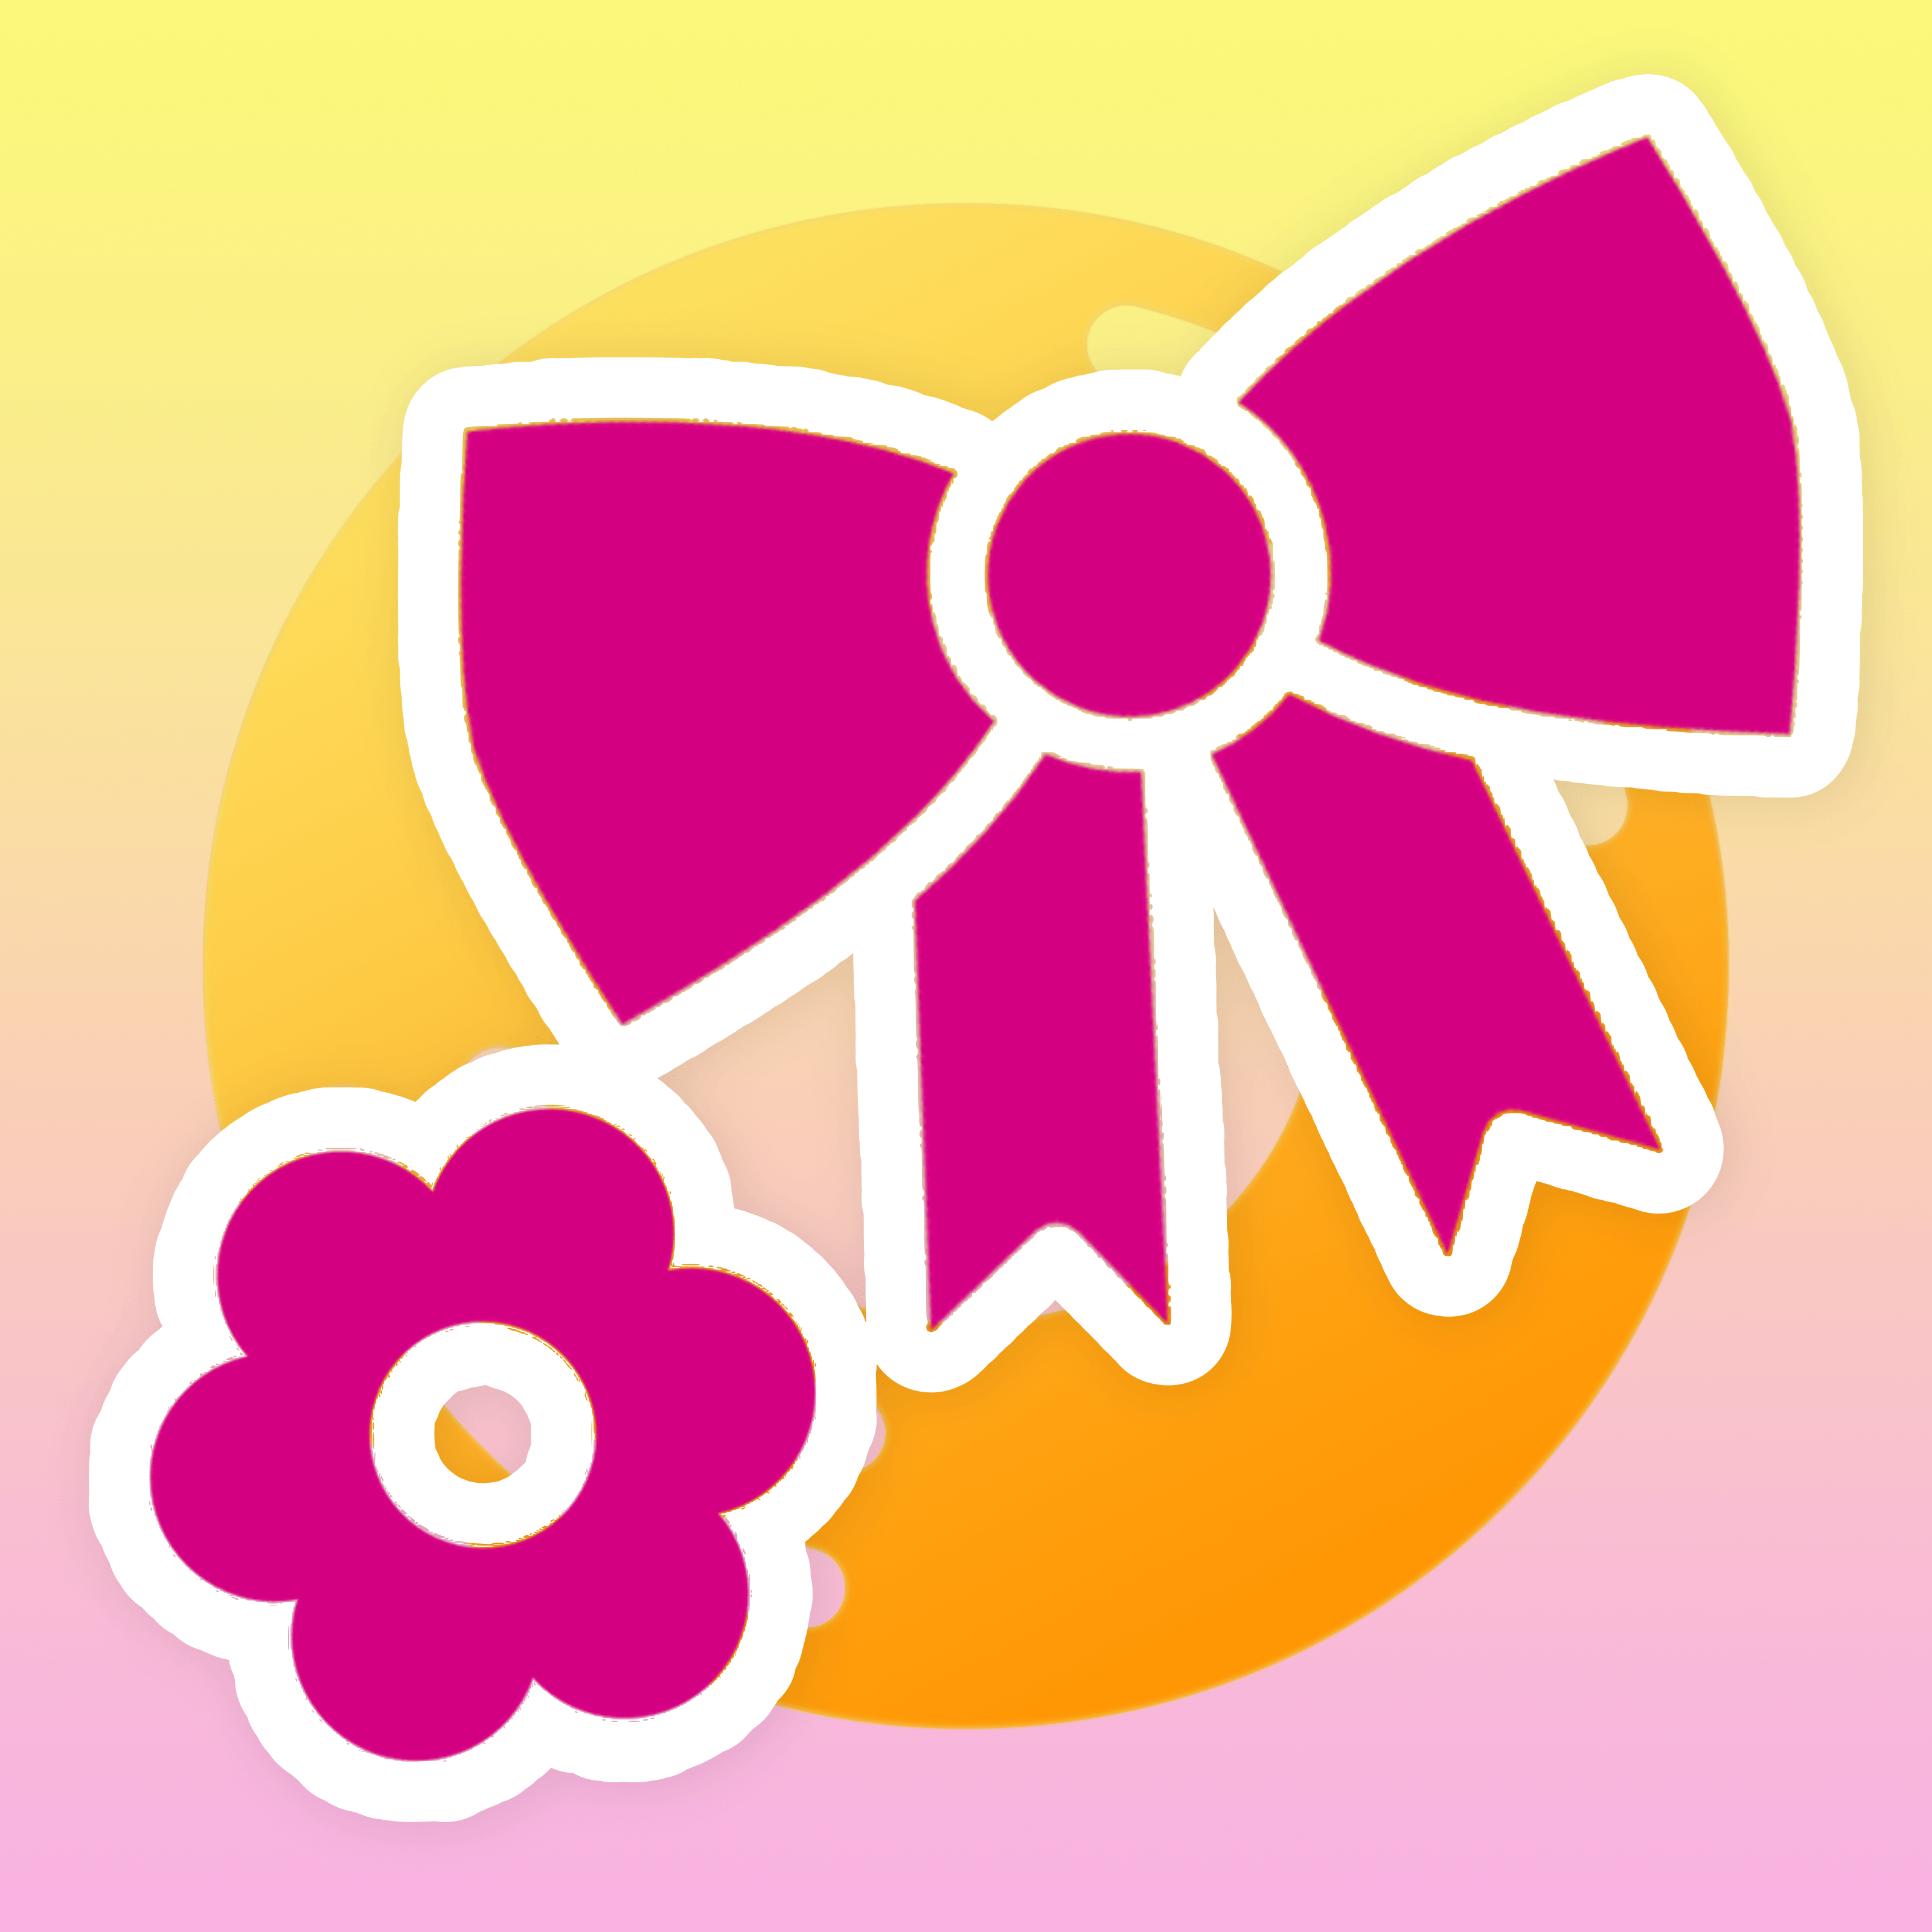 Tsunami2019 avatar